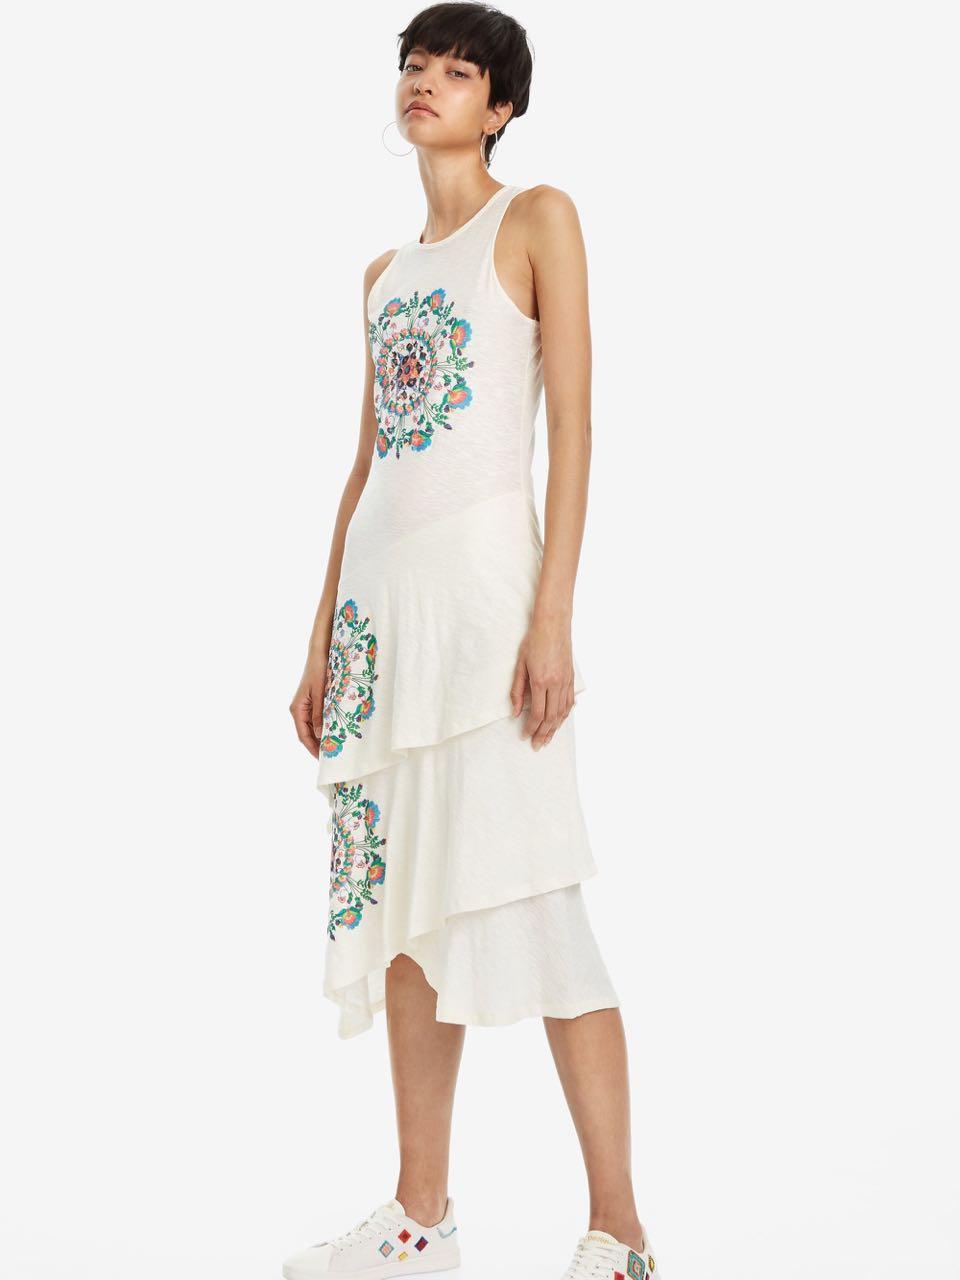 Desigual White Midi Dress Chelsea Ruffles 19swvk02 Summer 2019